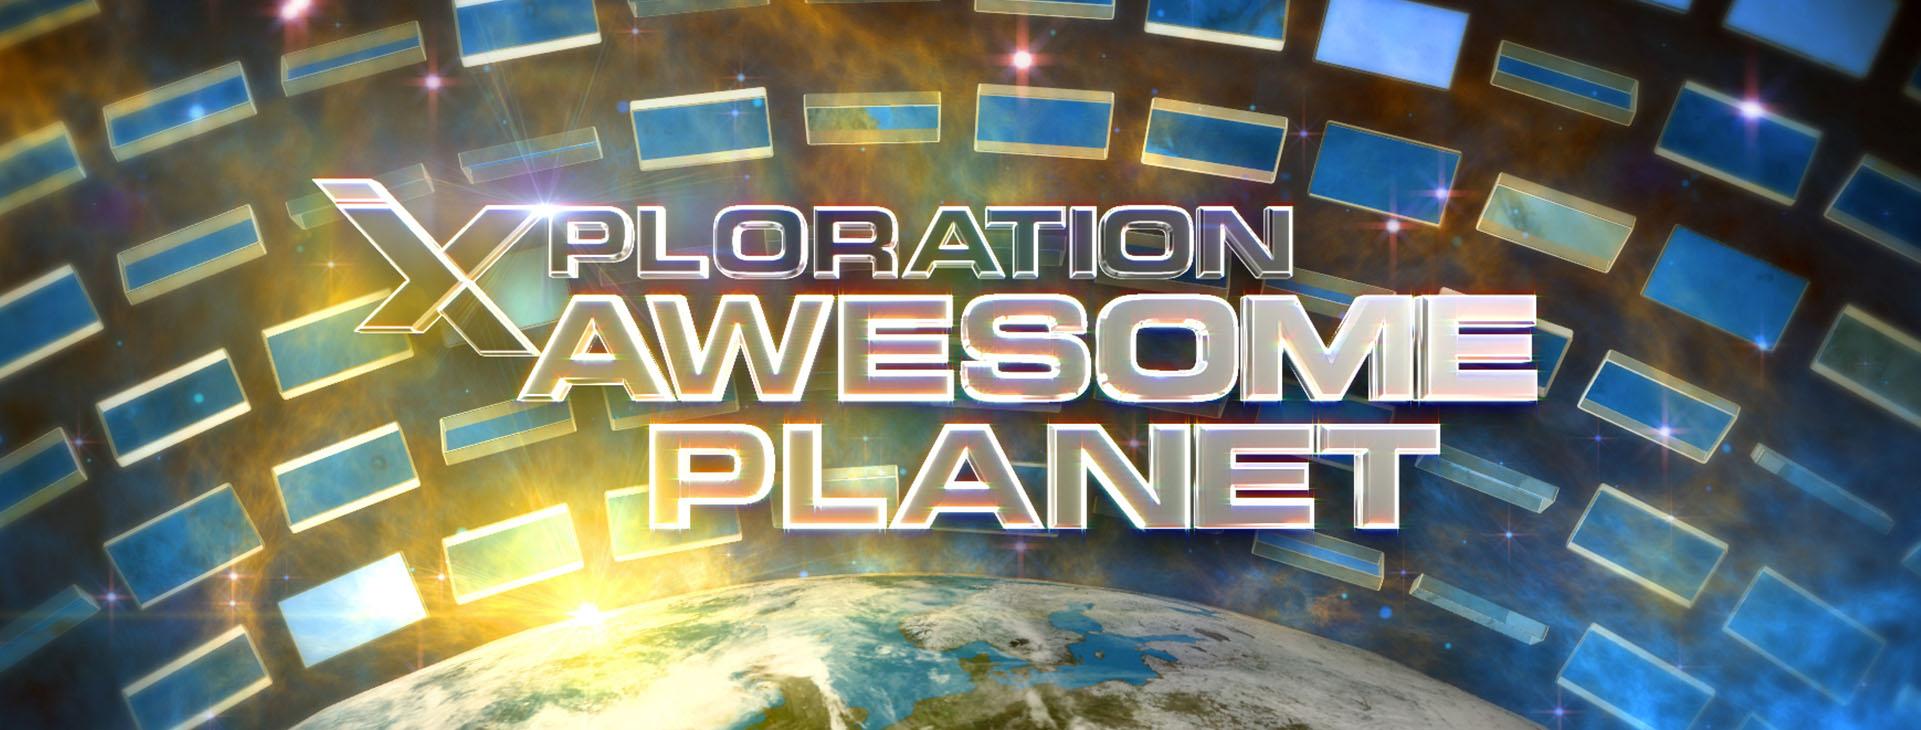 Xploration: Awesome Planet